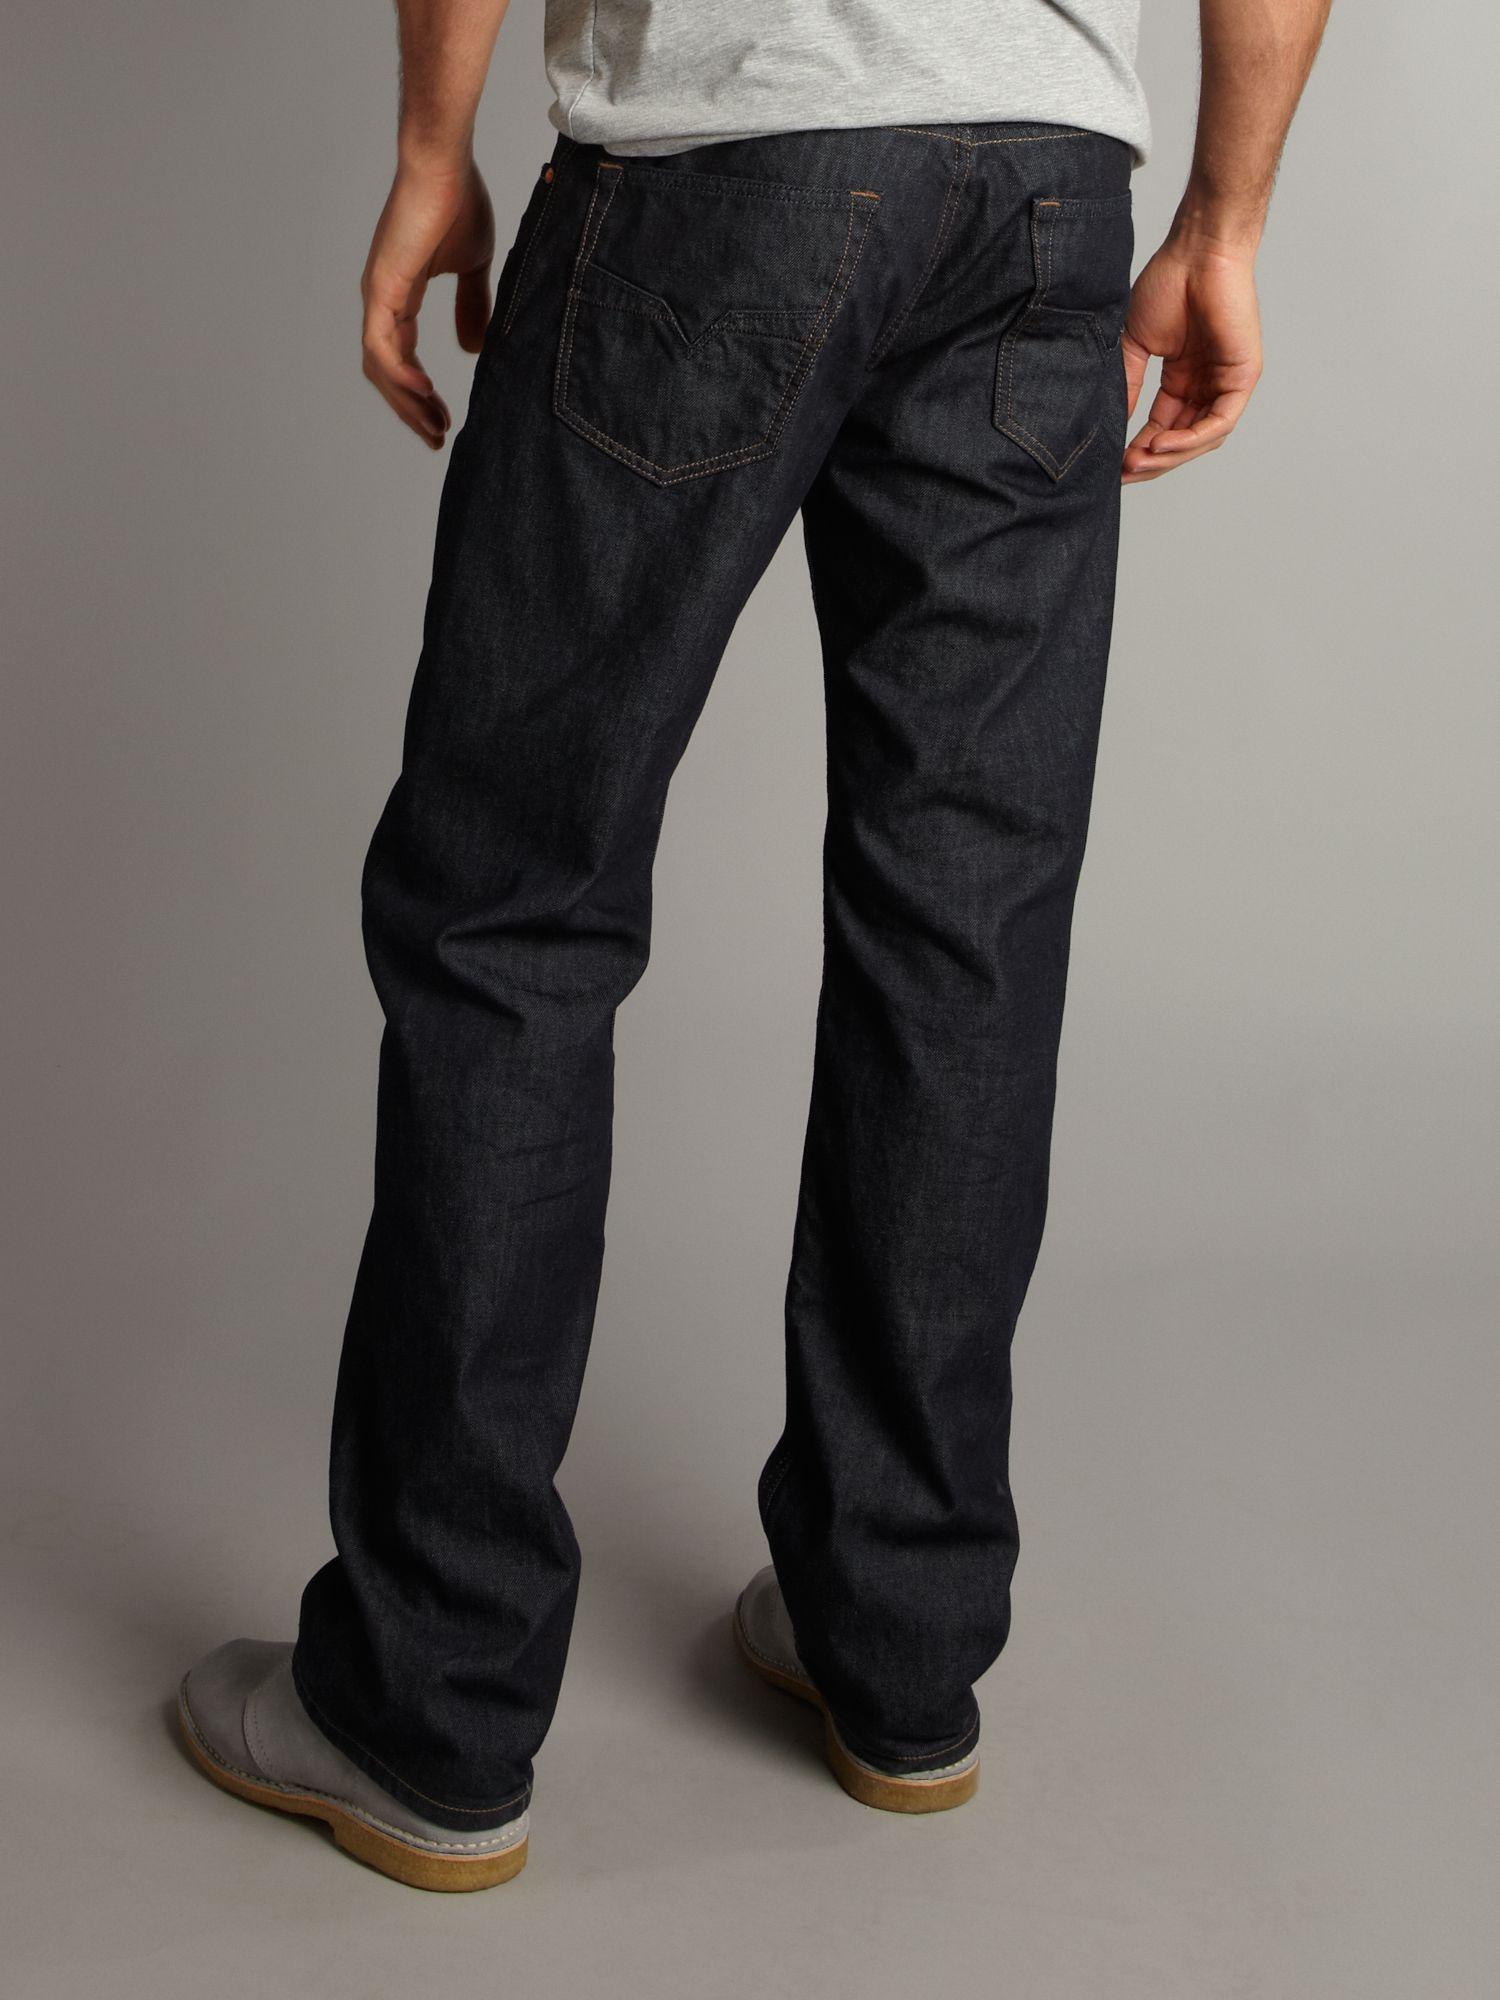 Black Straight Jeans Men